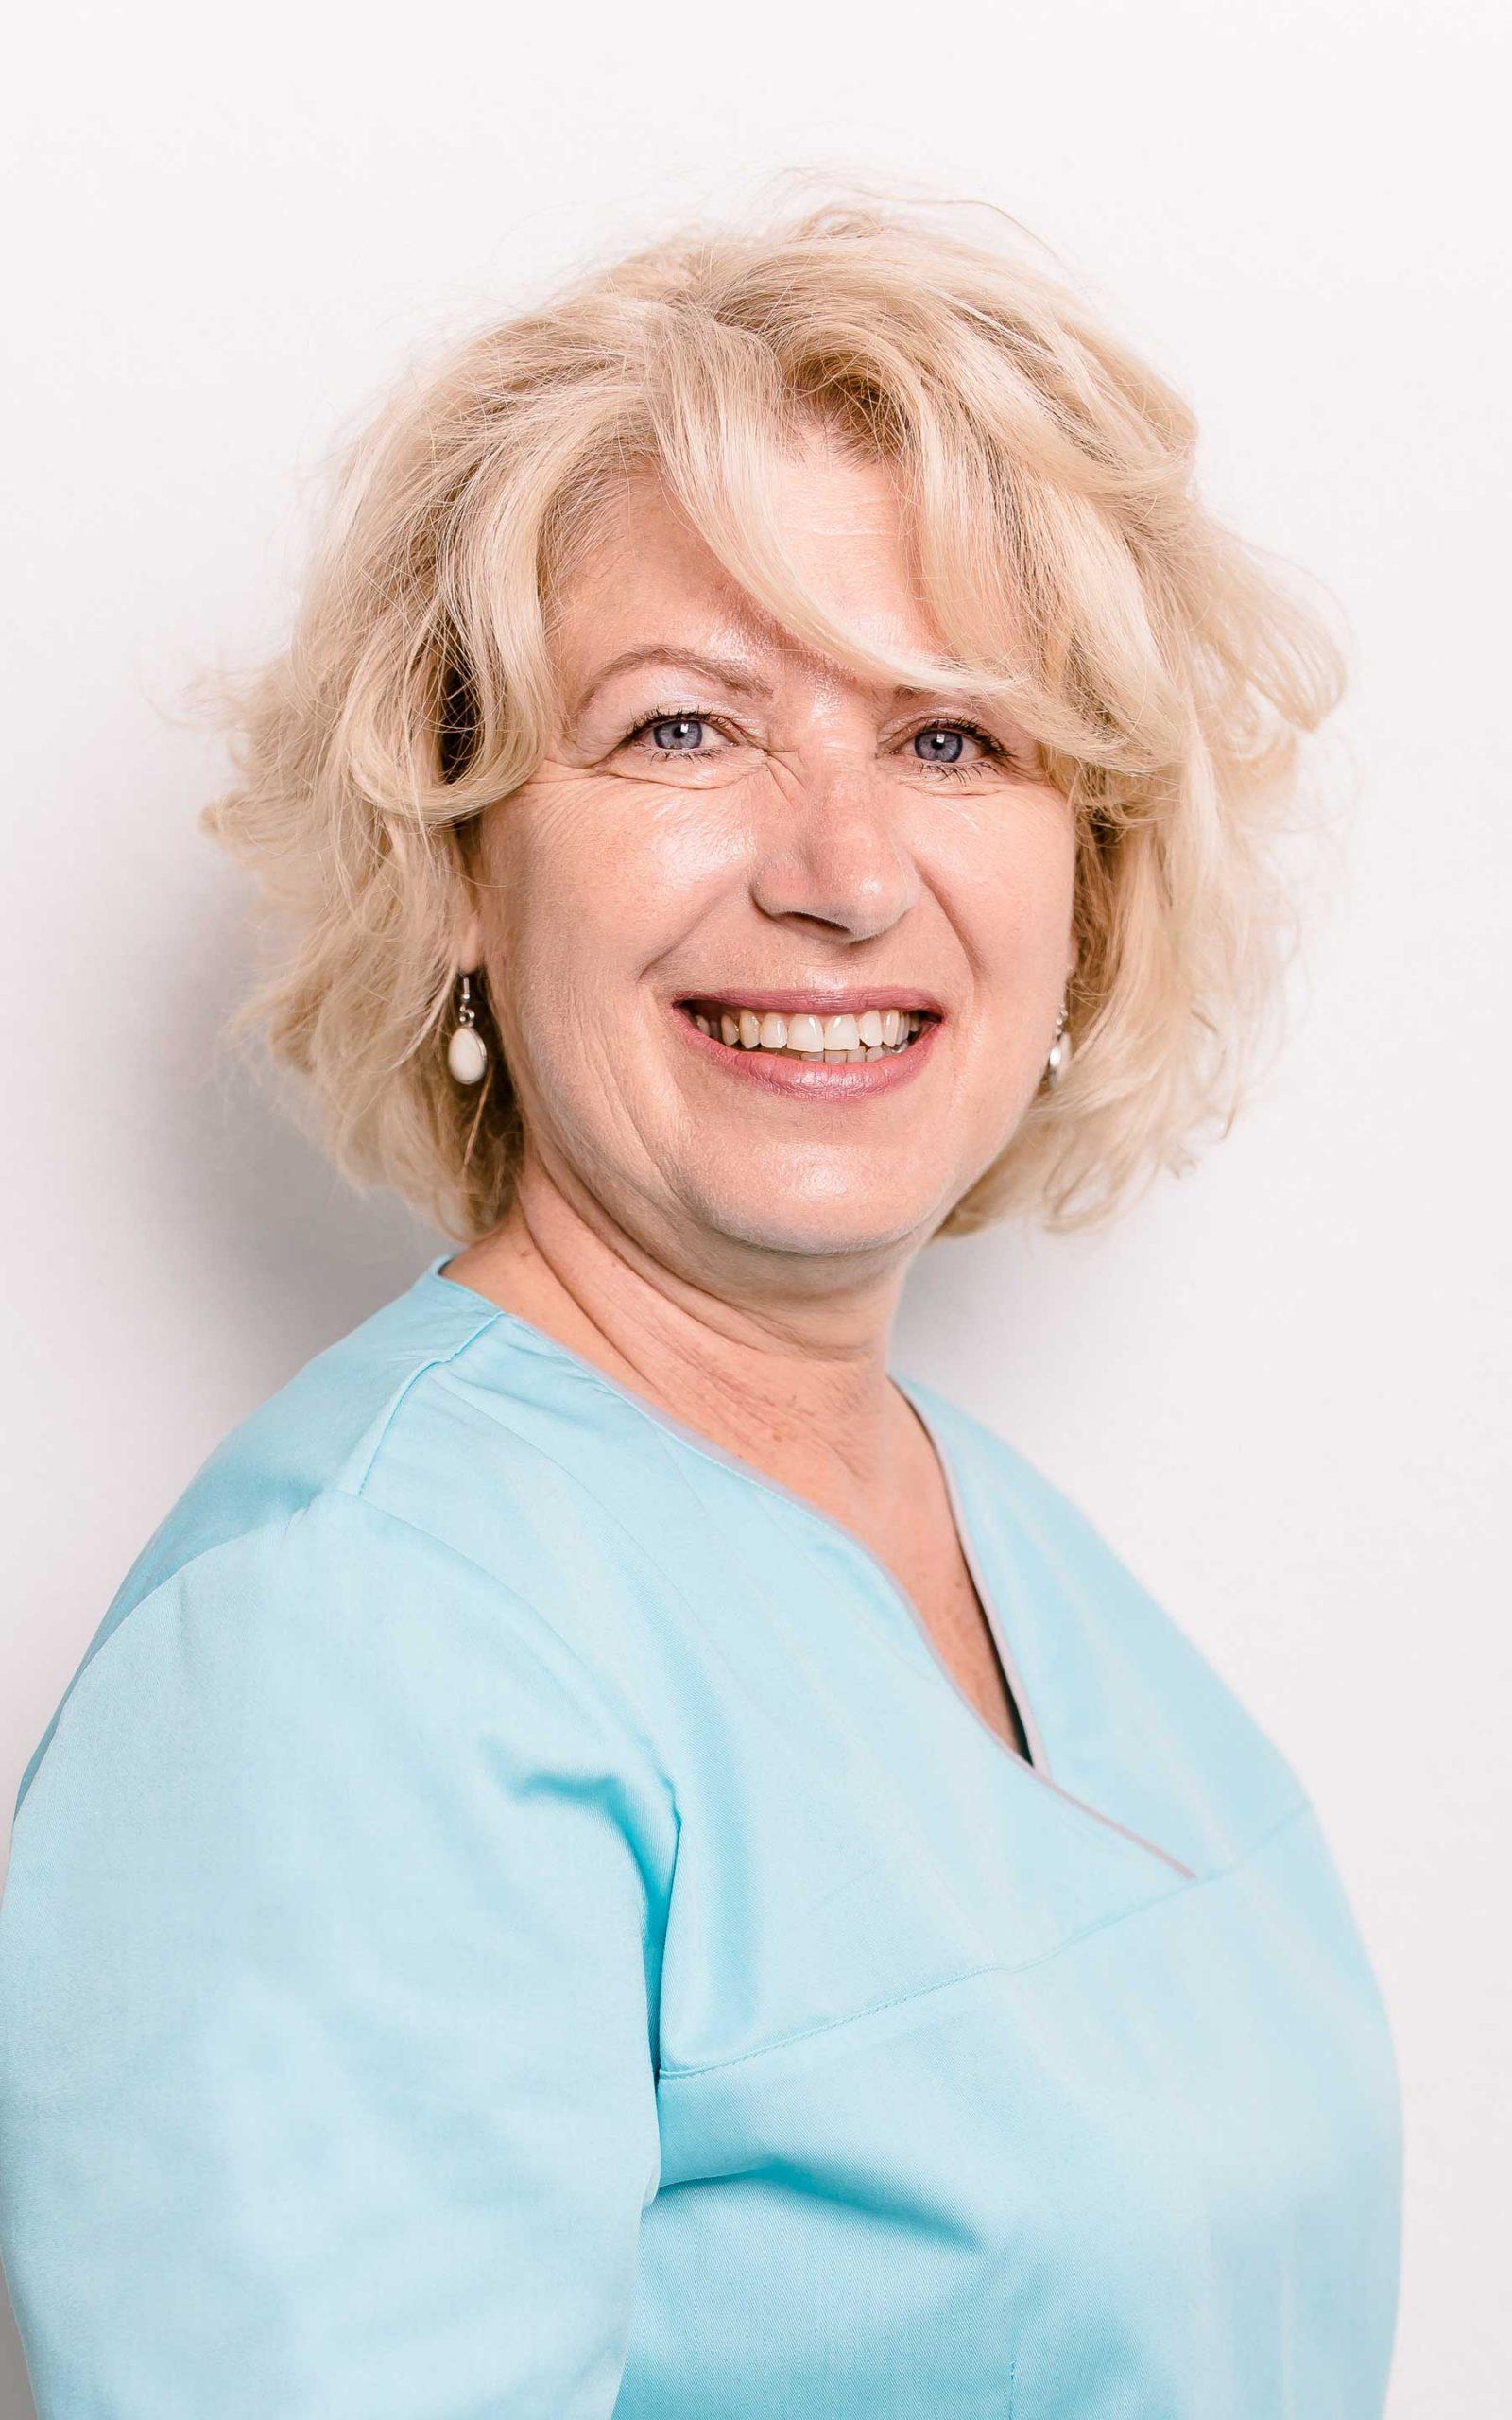 Zahnarztpraxis Barbutova Mitarbeiterin